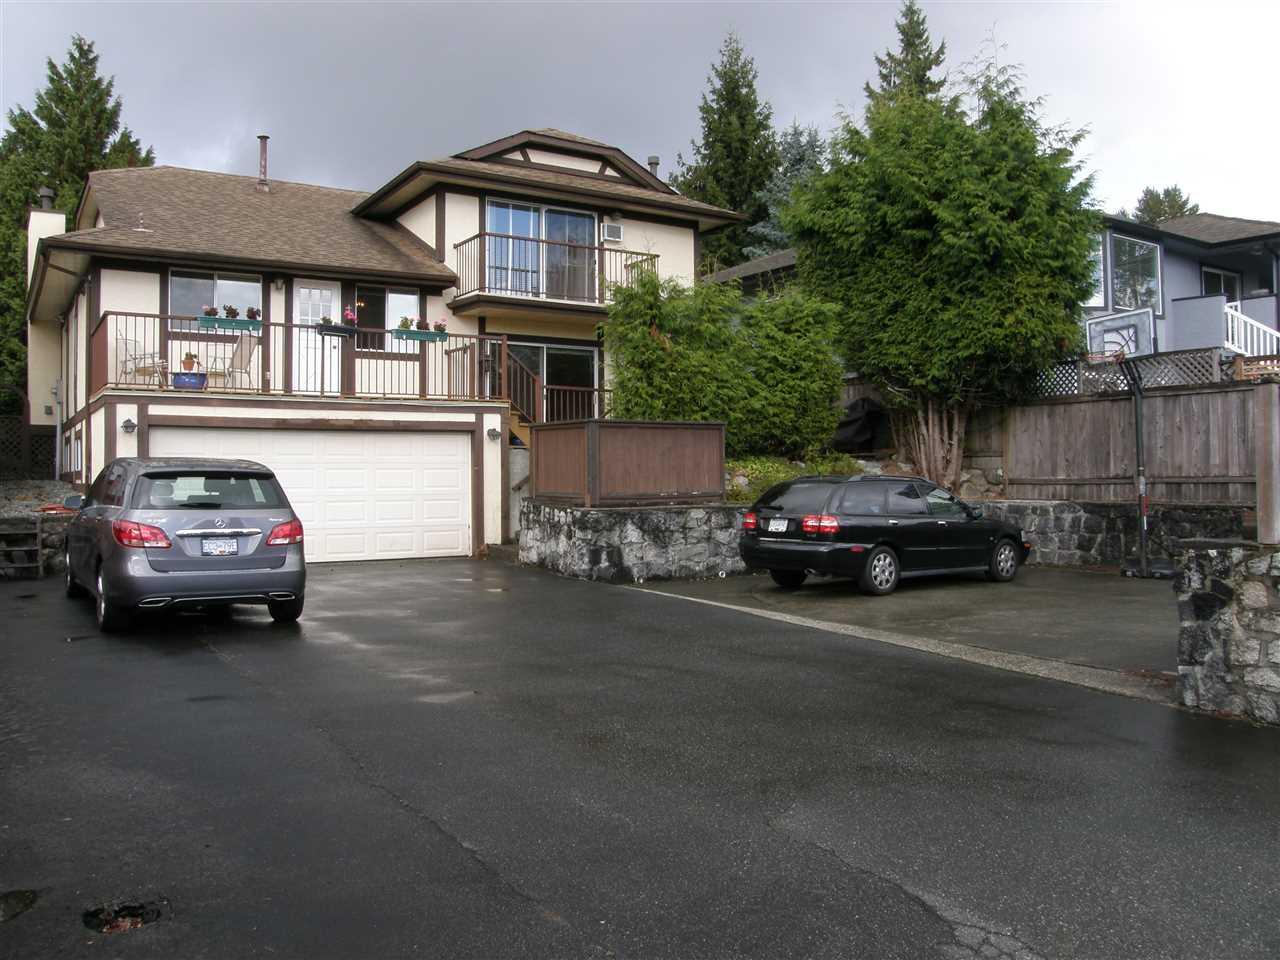 775 E 29TH STREET, North Vancouver, BC, V7K 3B3 Photo 1